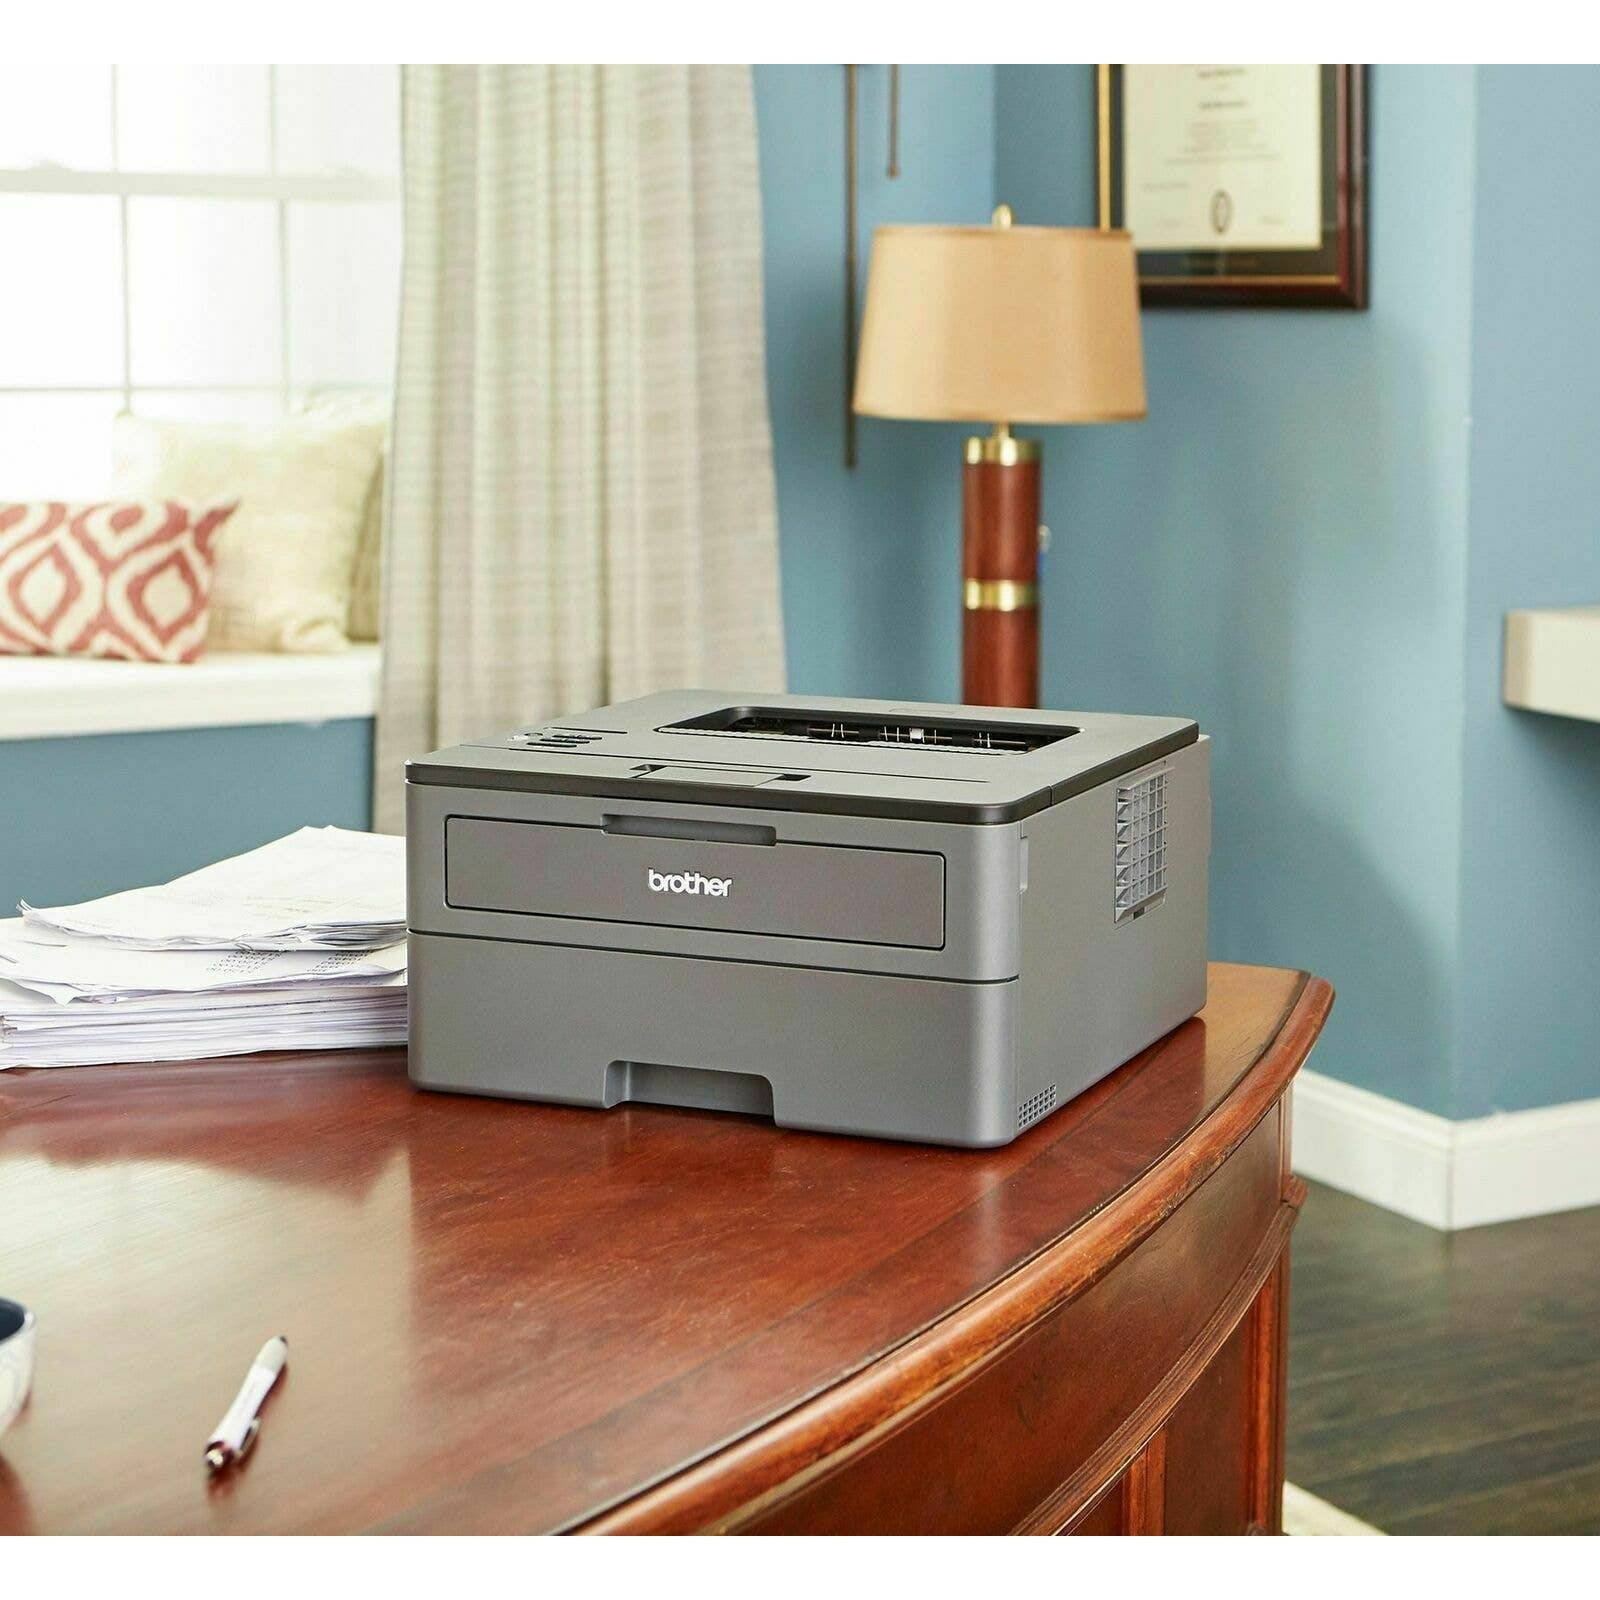 Brother HL-L2300D Wireless Laser Printer